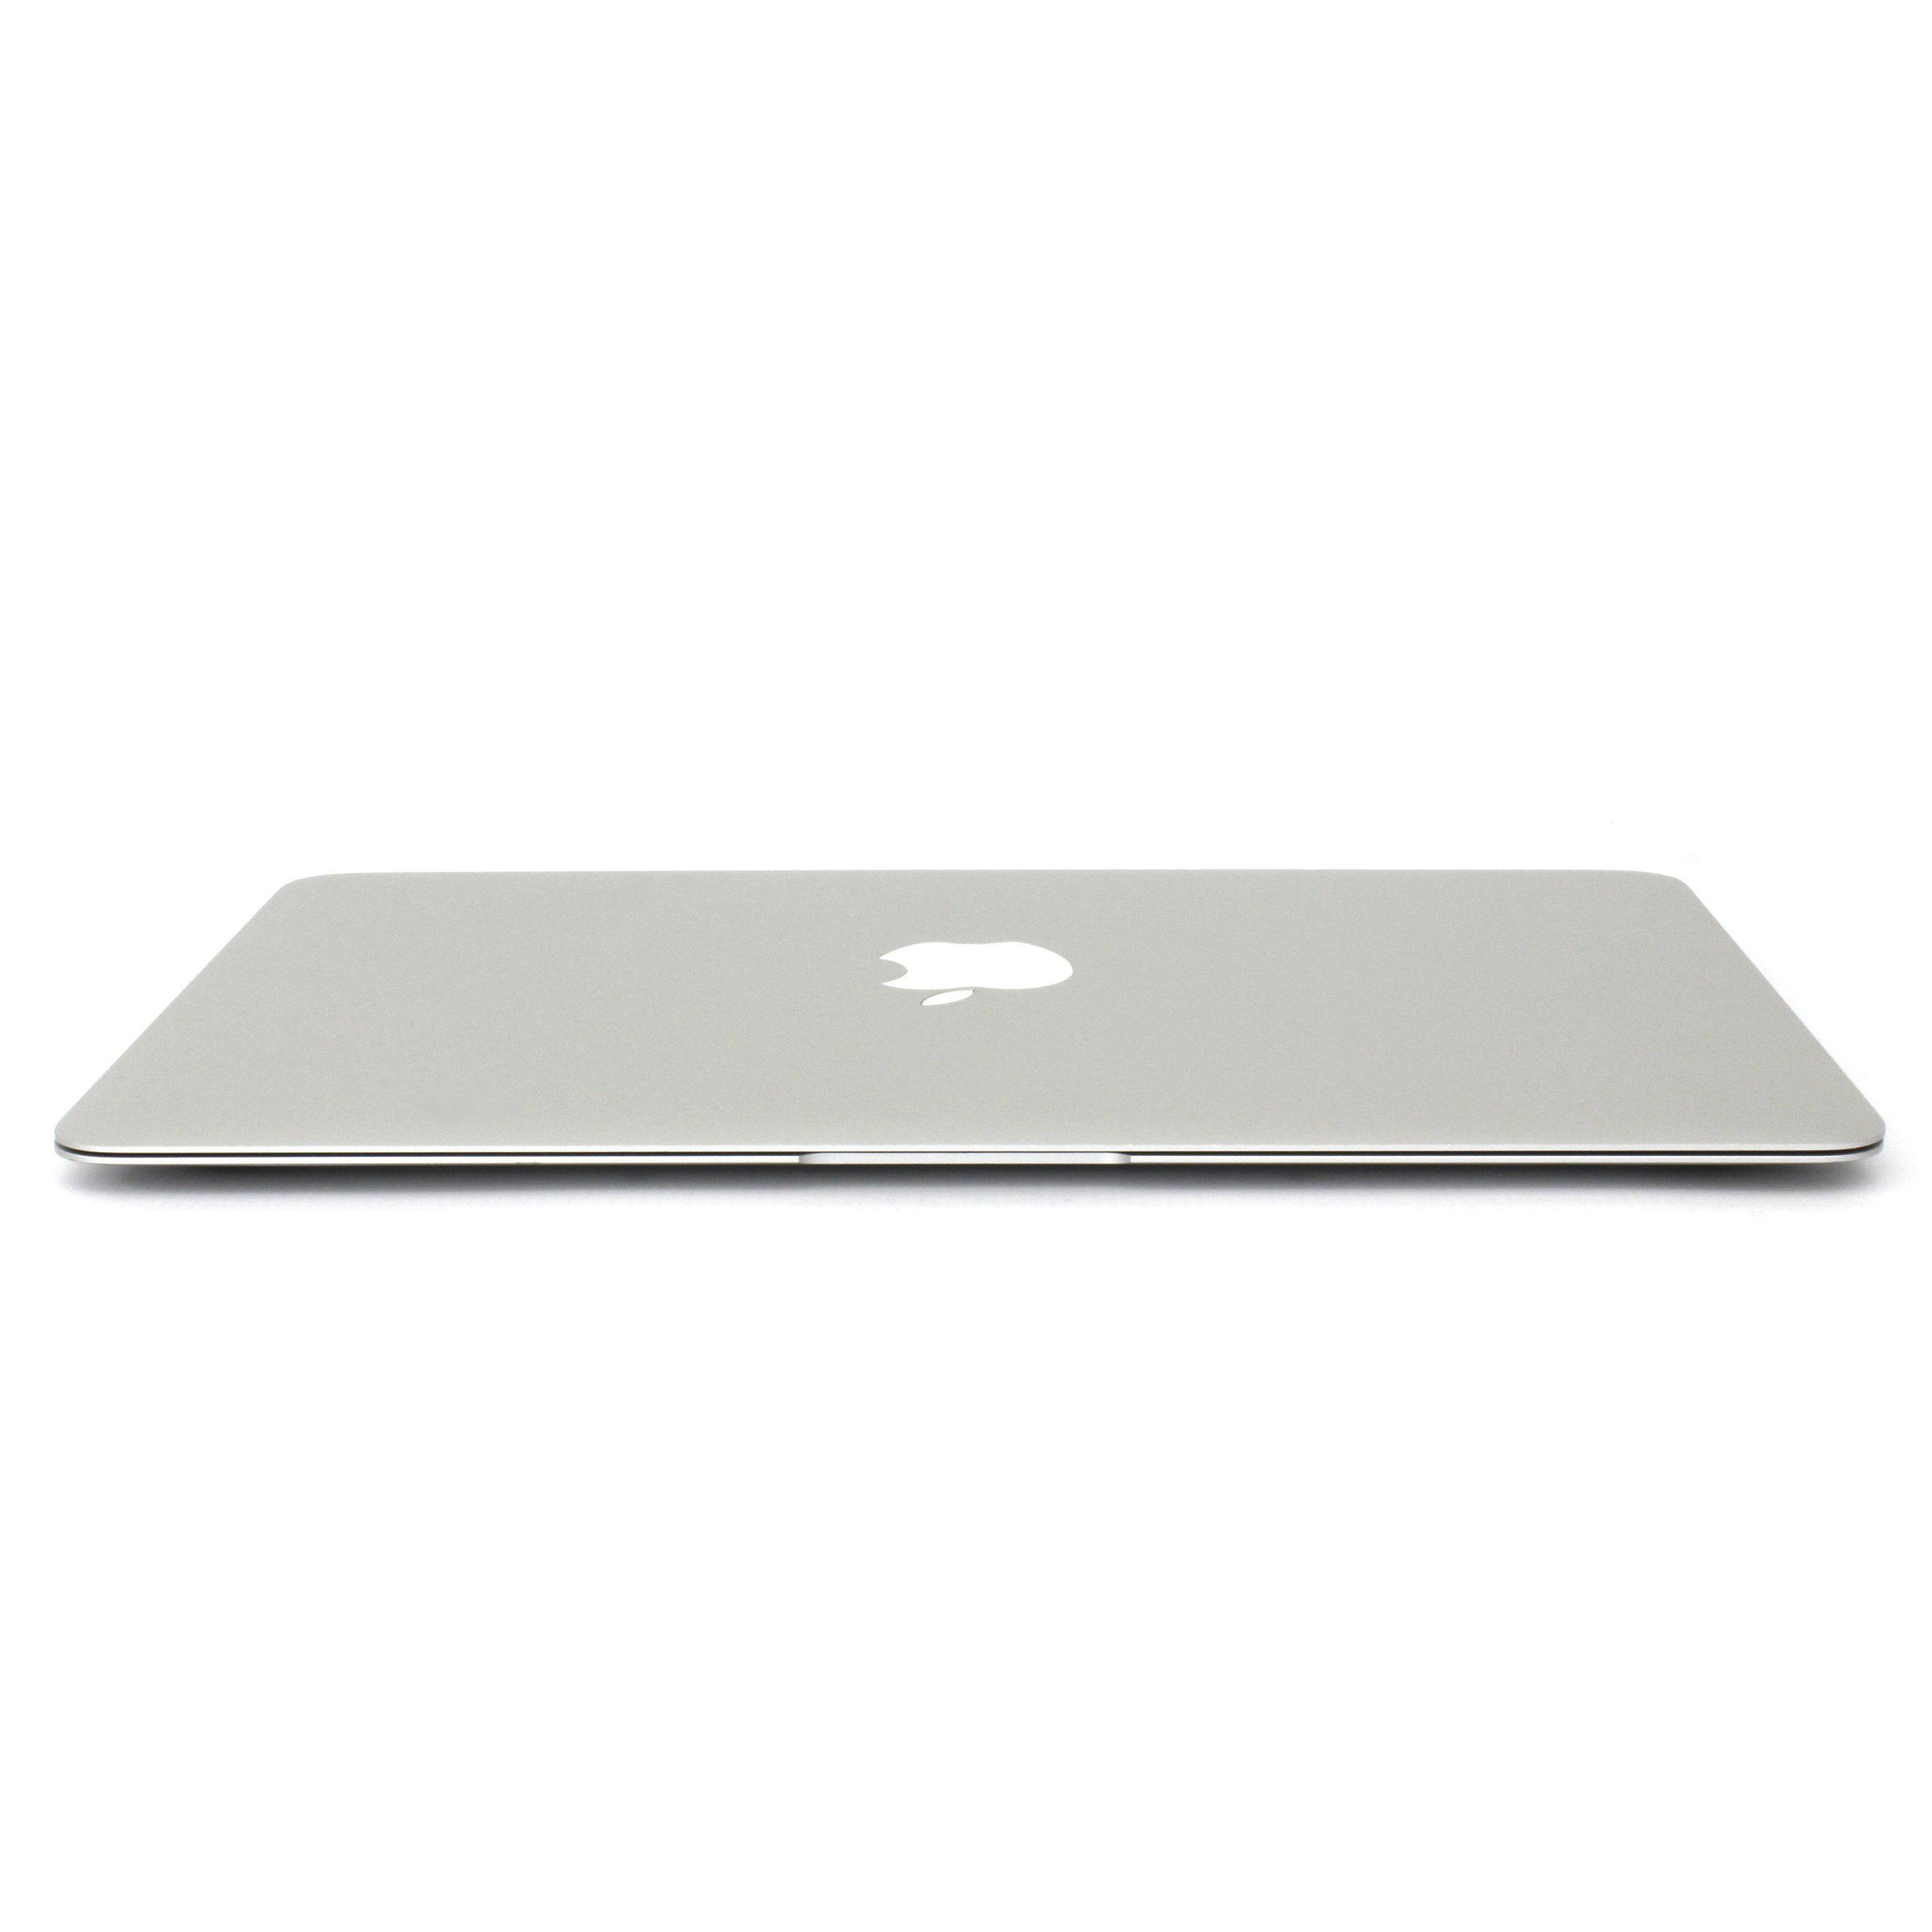 "MacBook Air 11,6"" (2012) - Core i5 - 4GB - SSD 128 GB QWERTZ - Nemecká"